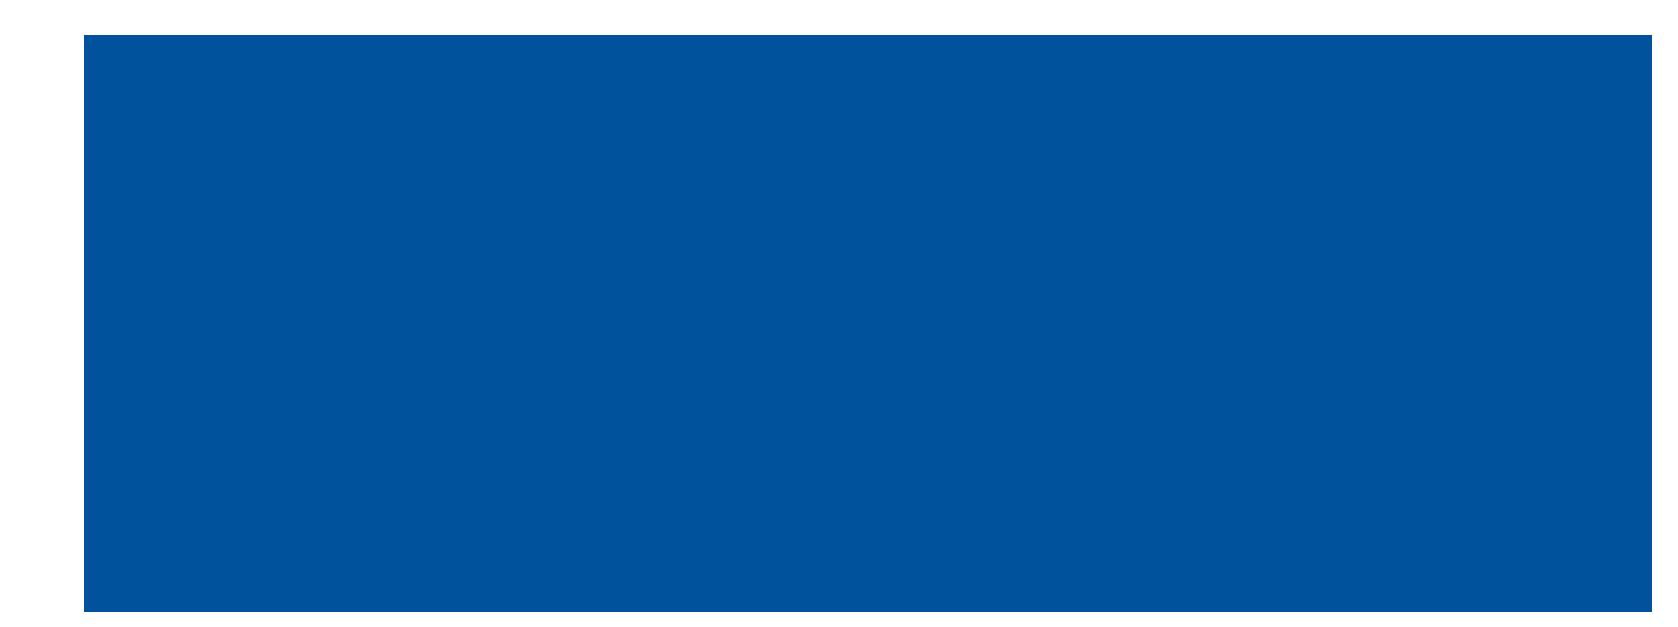 Comparing Euro 1 and Euro 6 emissions